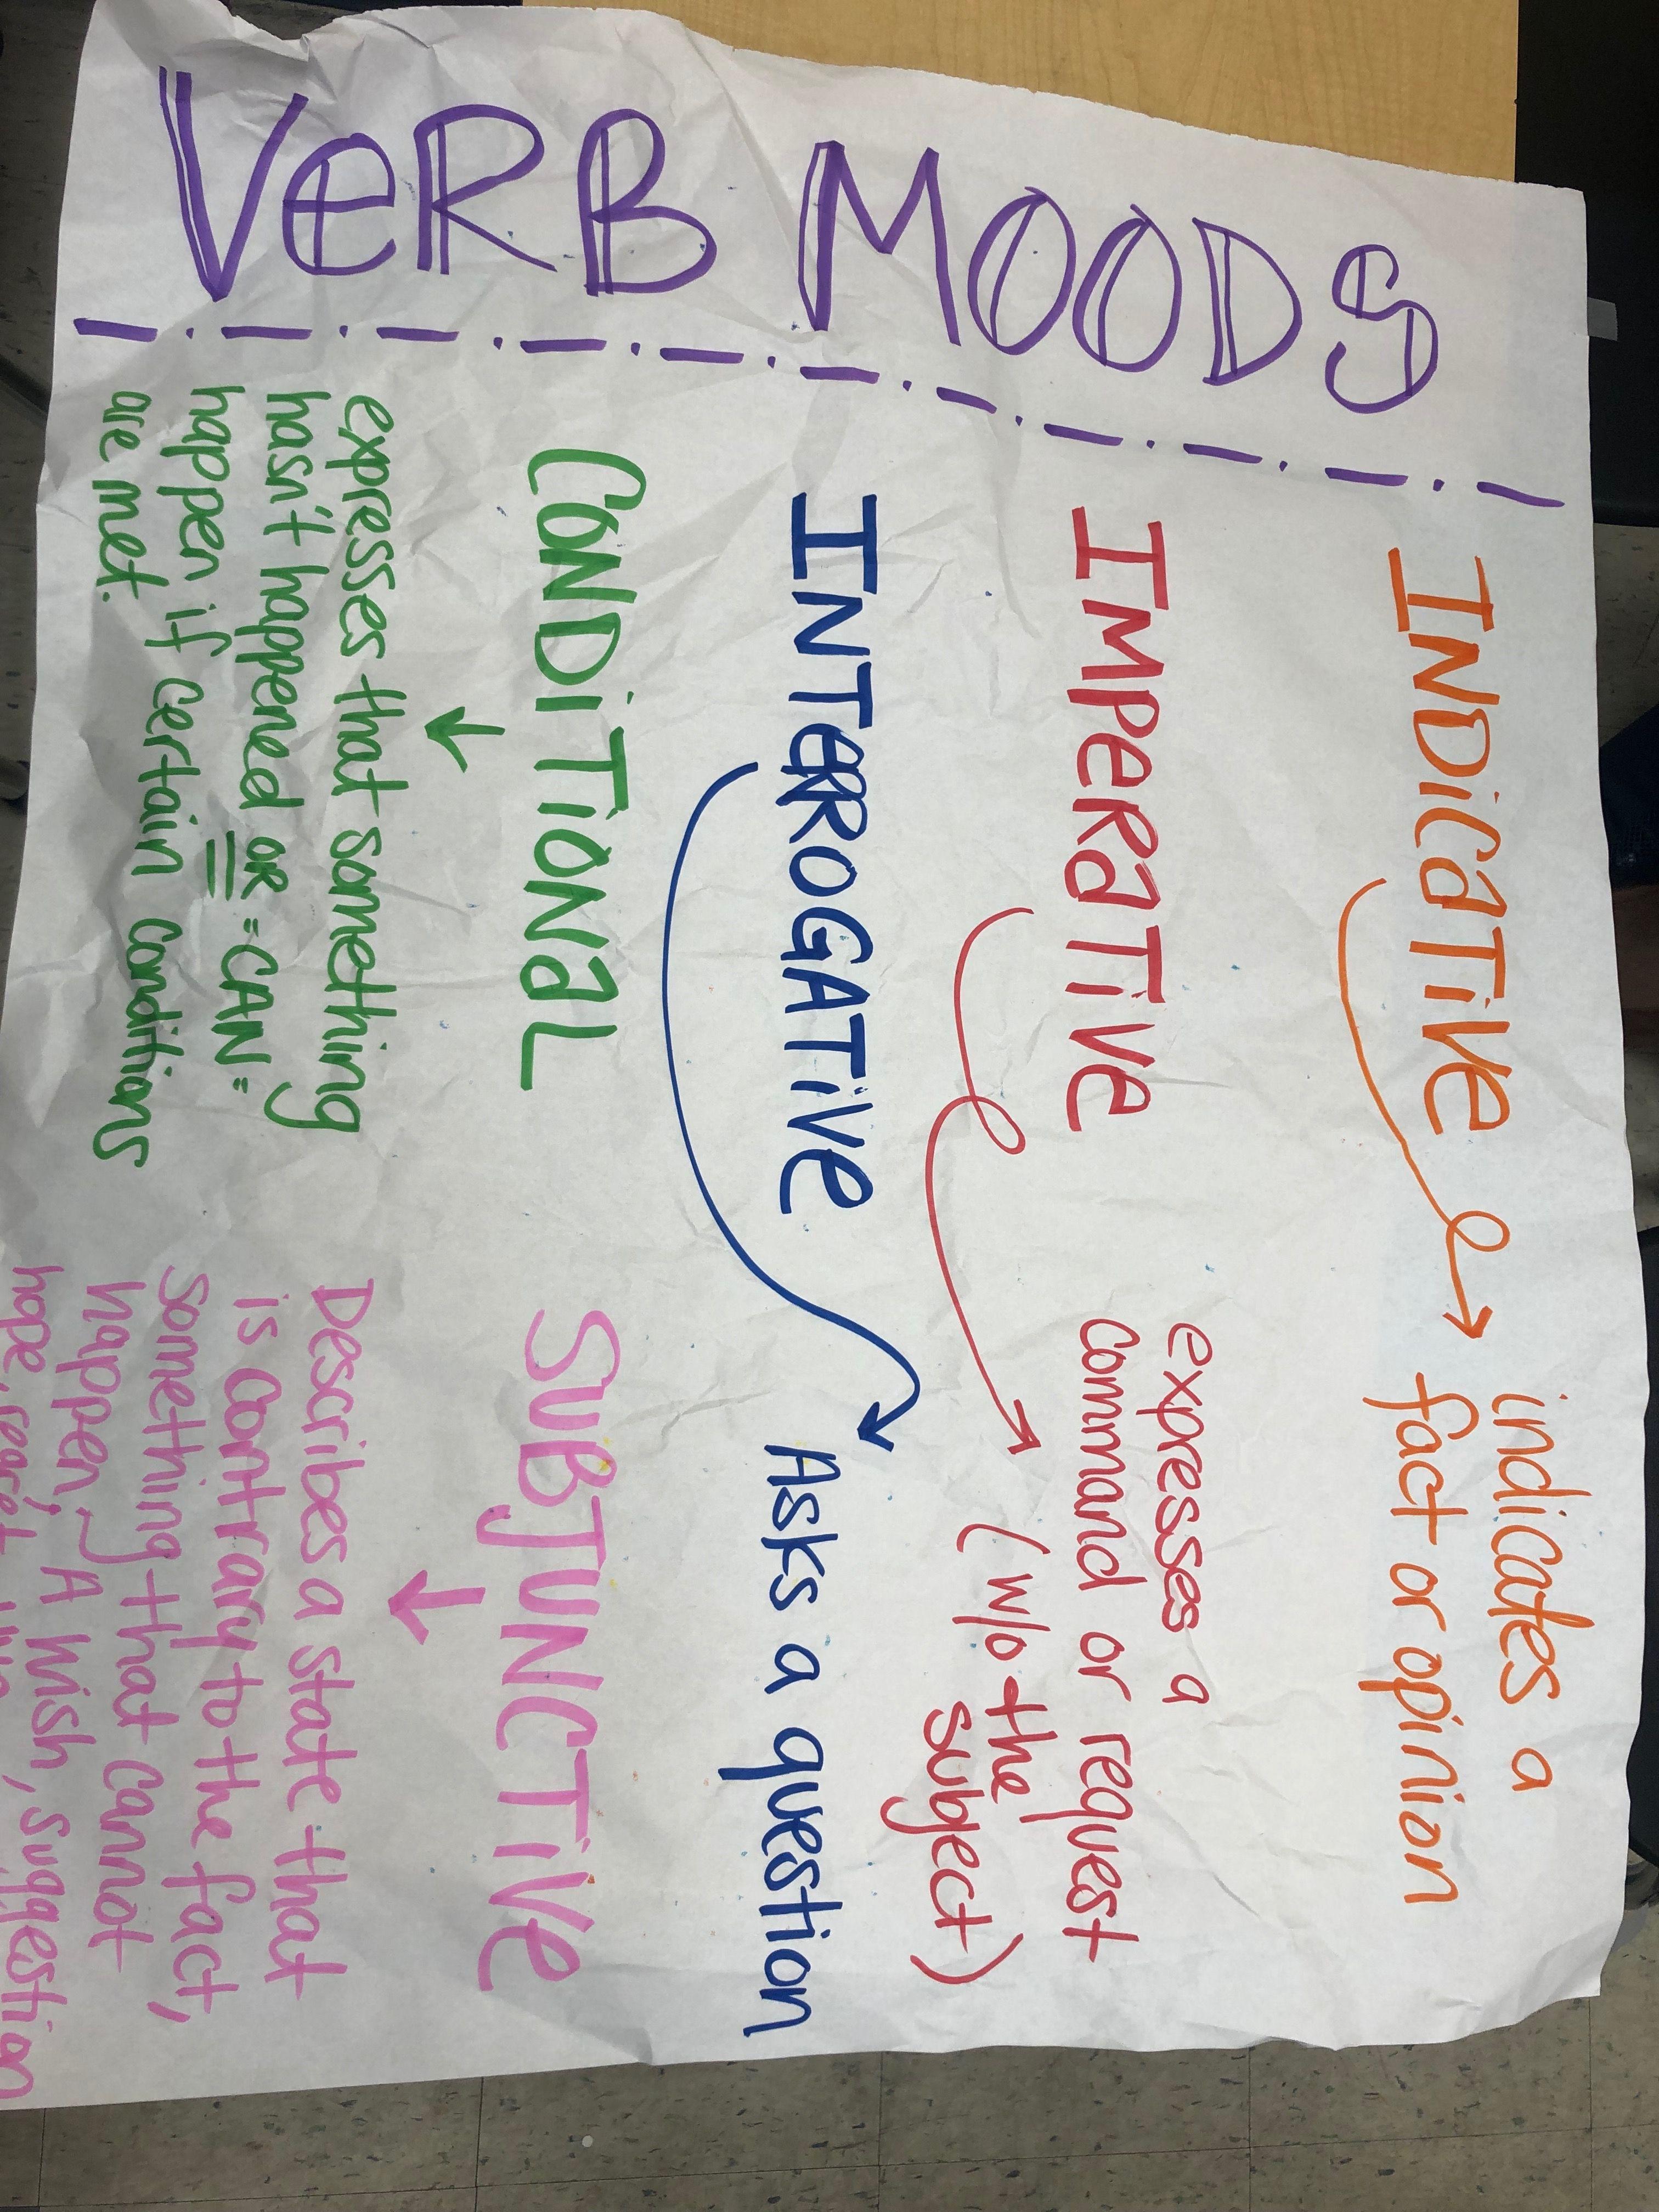 Verb Moods Anchor Chart Teaching Verbs Writing Classes 8th Grade Ela [ 4032 x 3024 Pixel ]